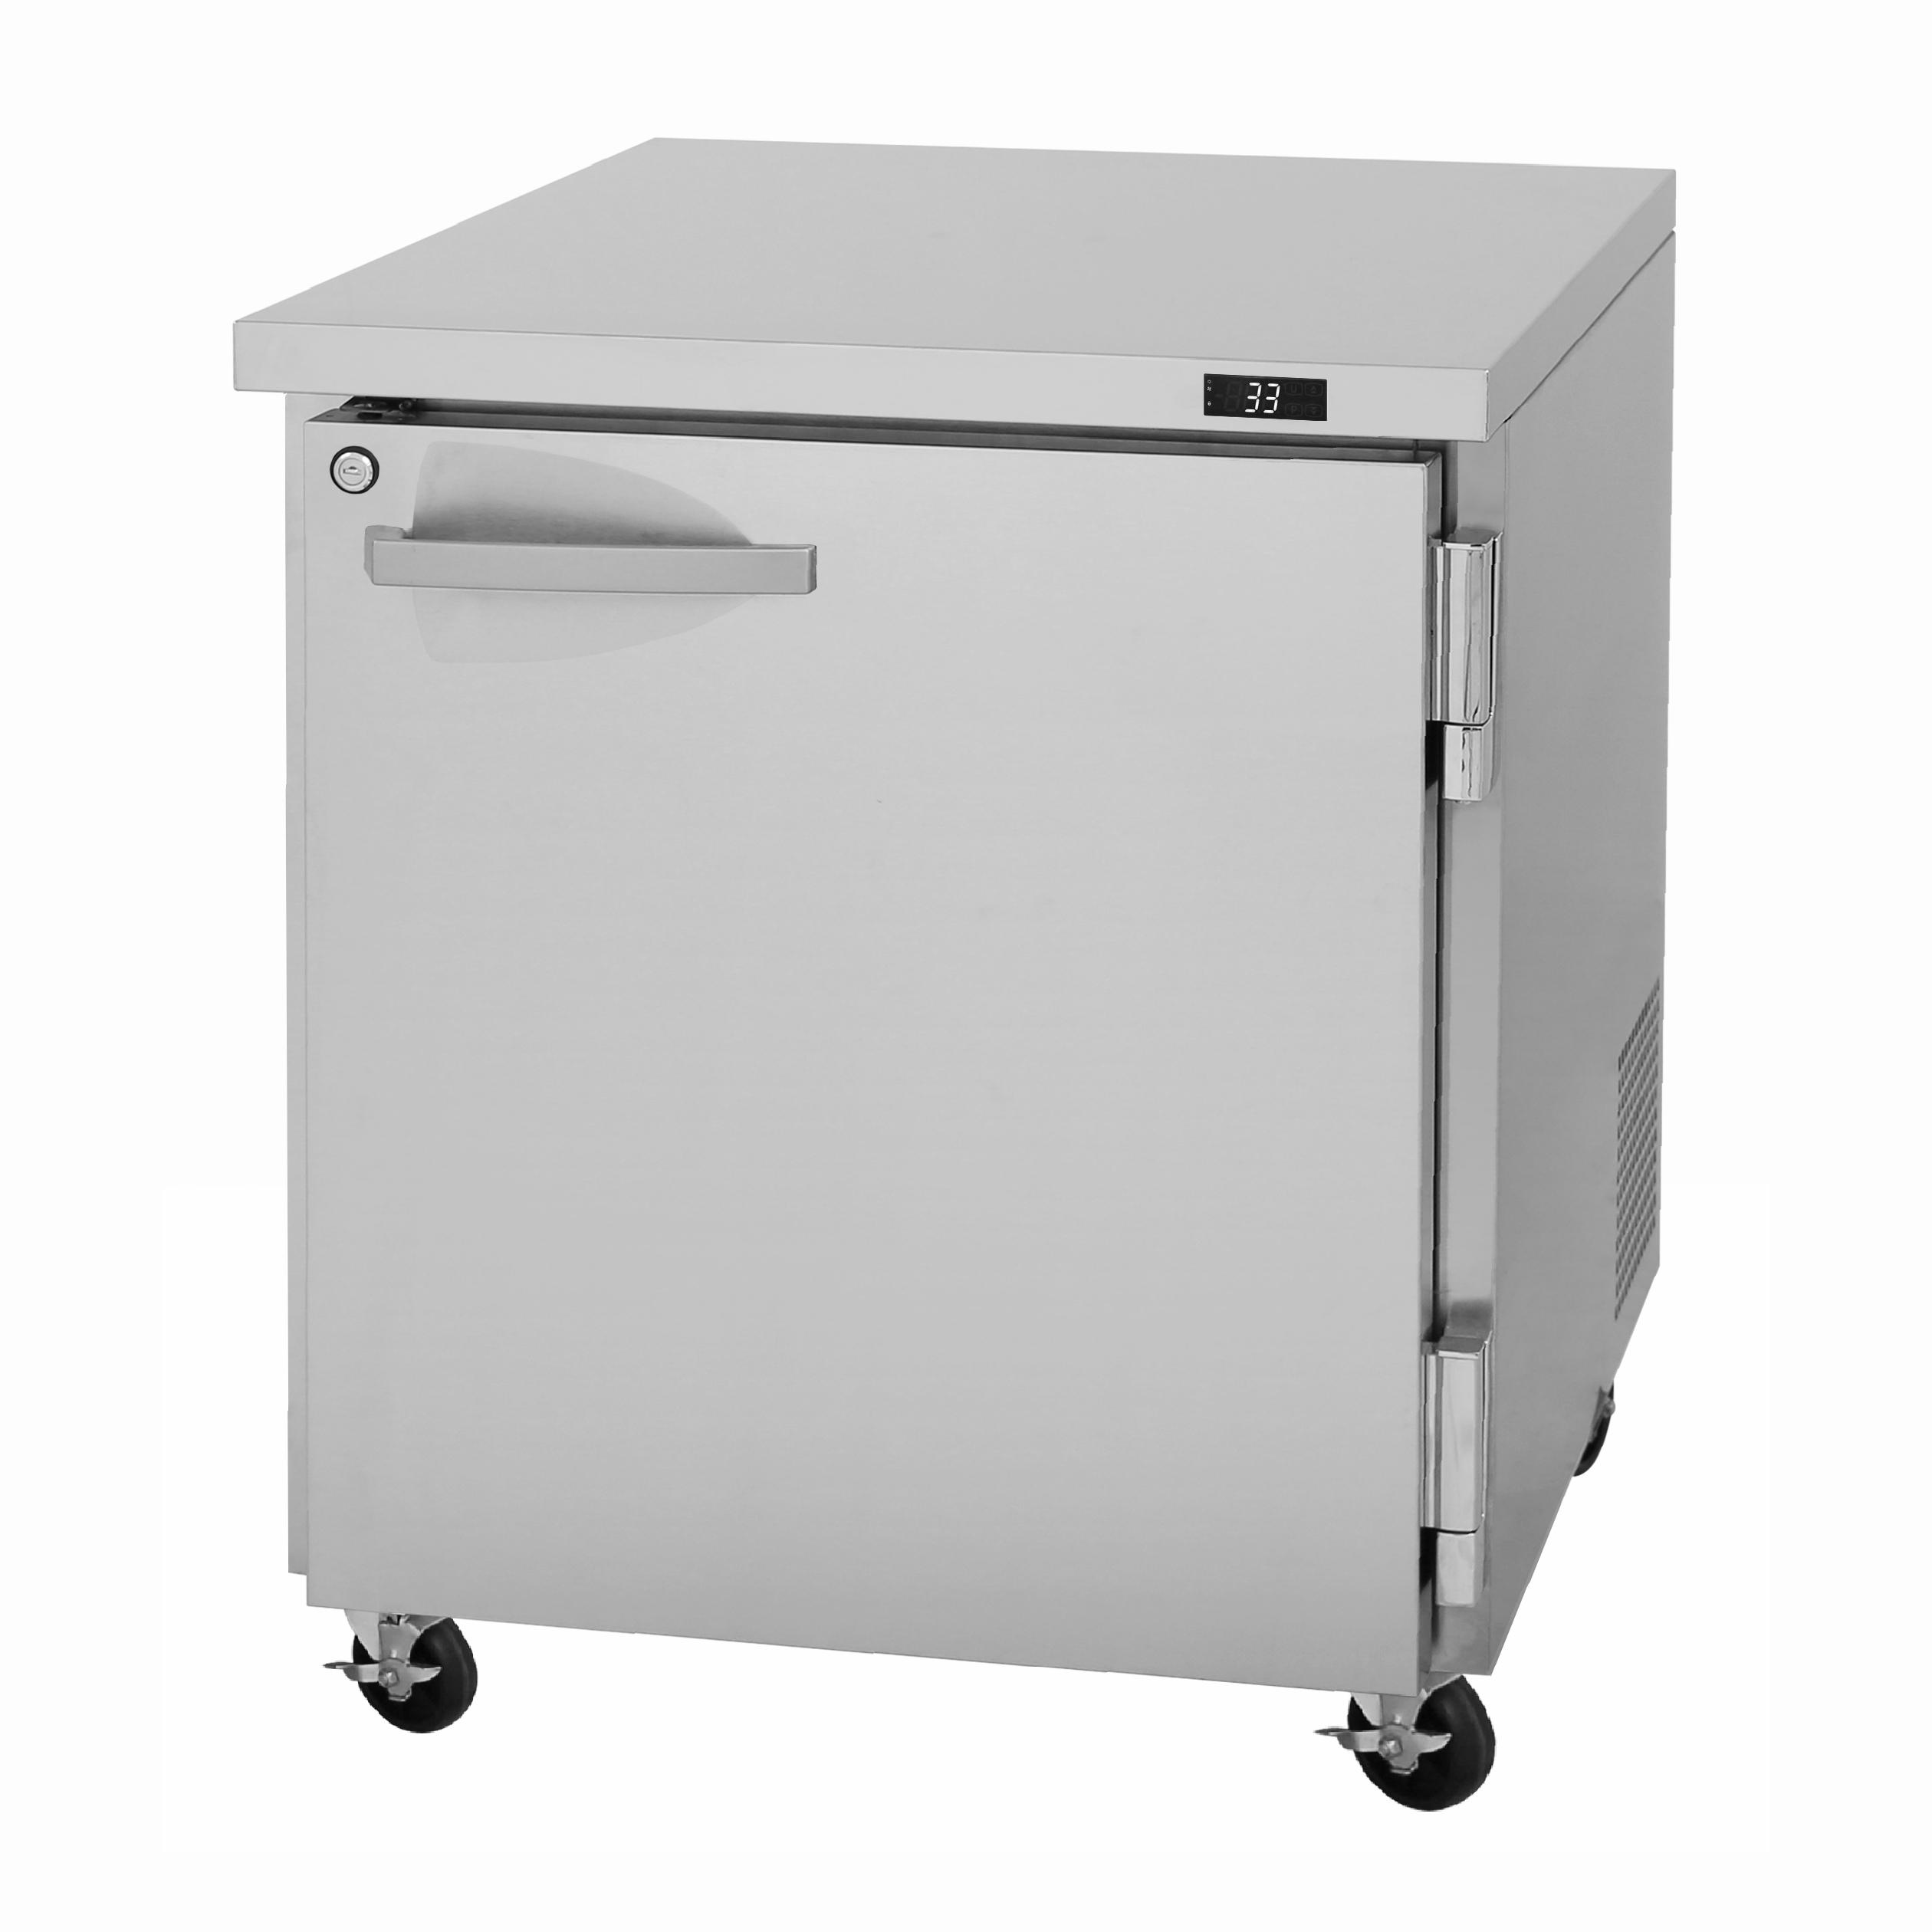 Turbo Air PUF-28-N freezer, undercounter, reach-in